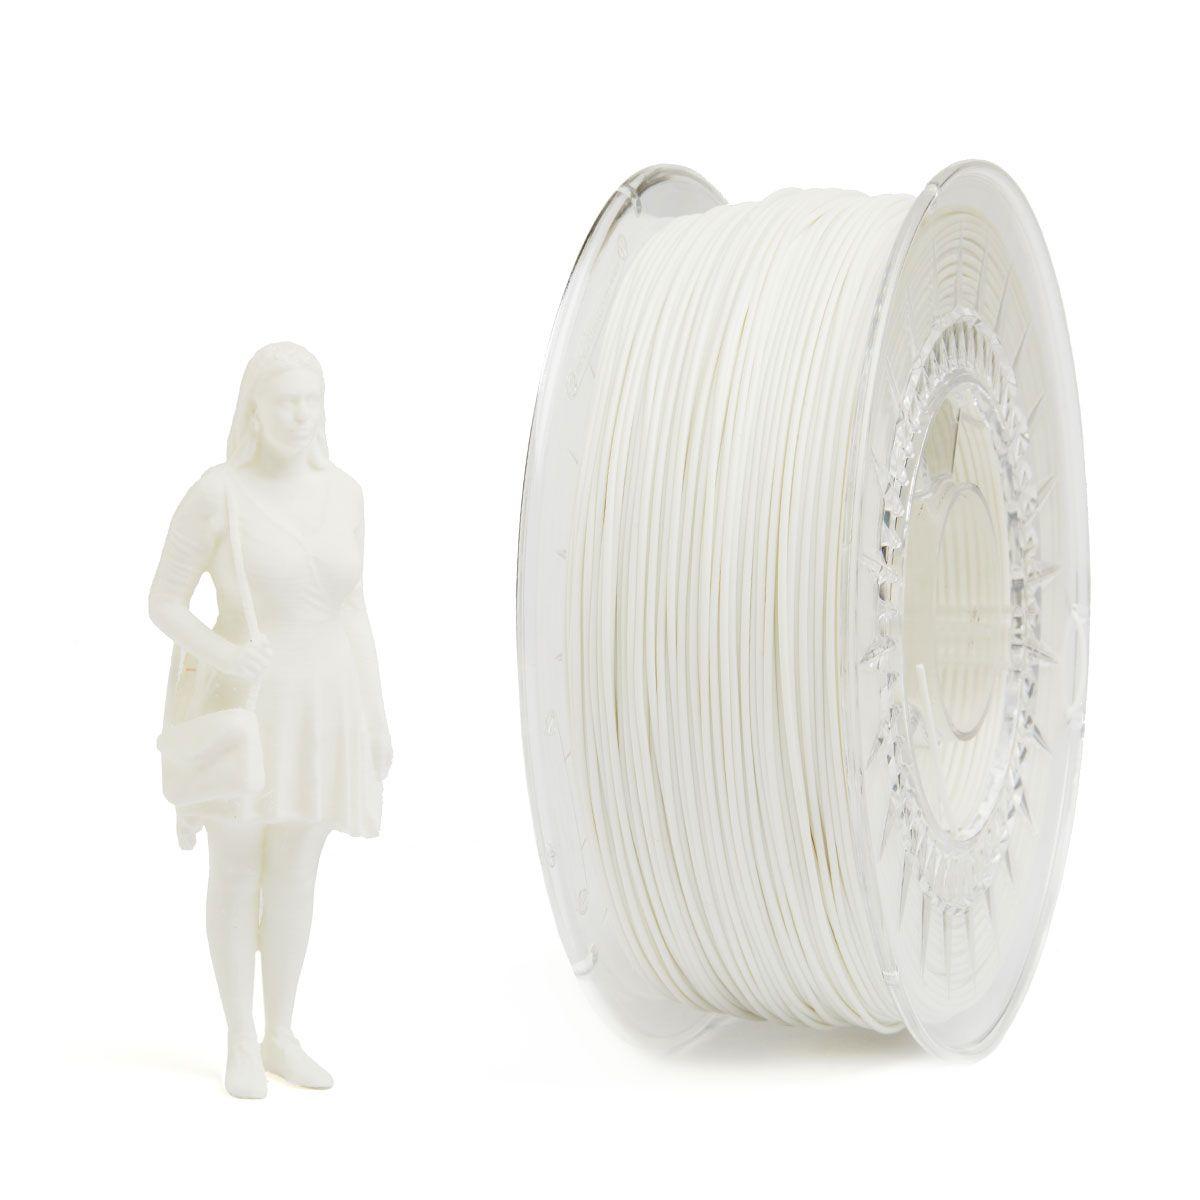 FAST PRINTS PLA Filament | Color: White